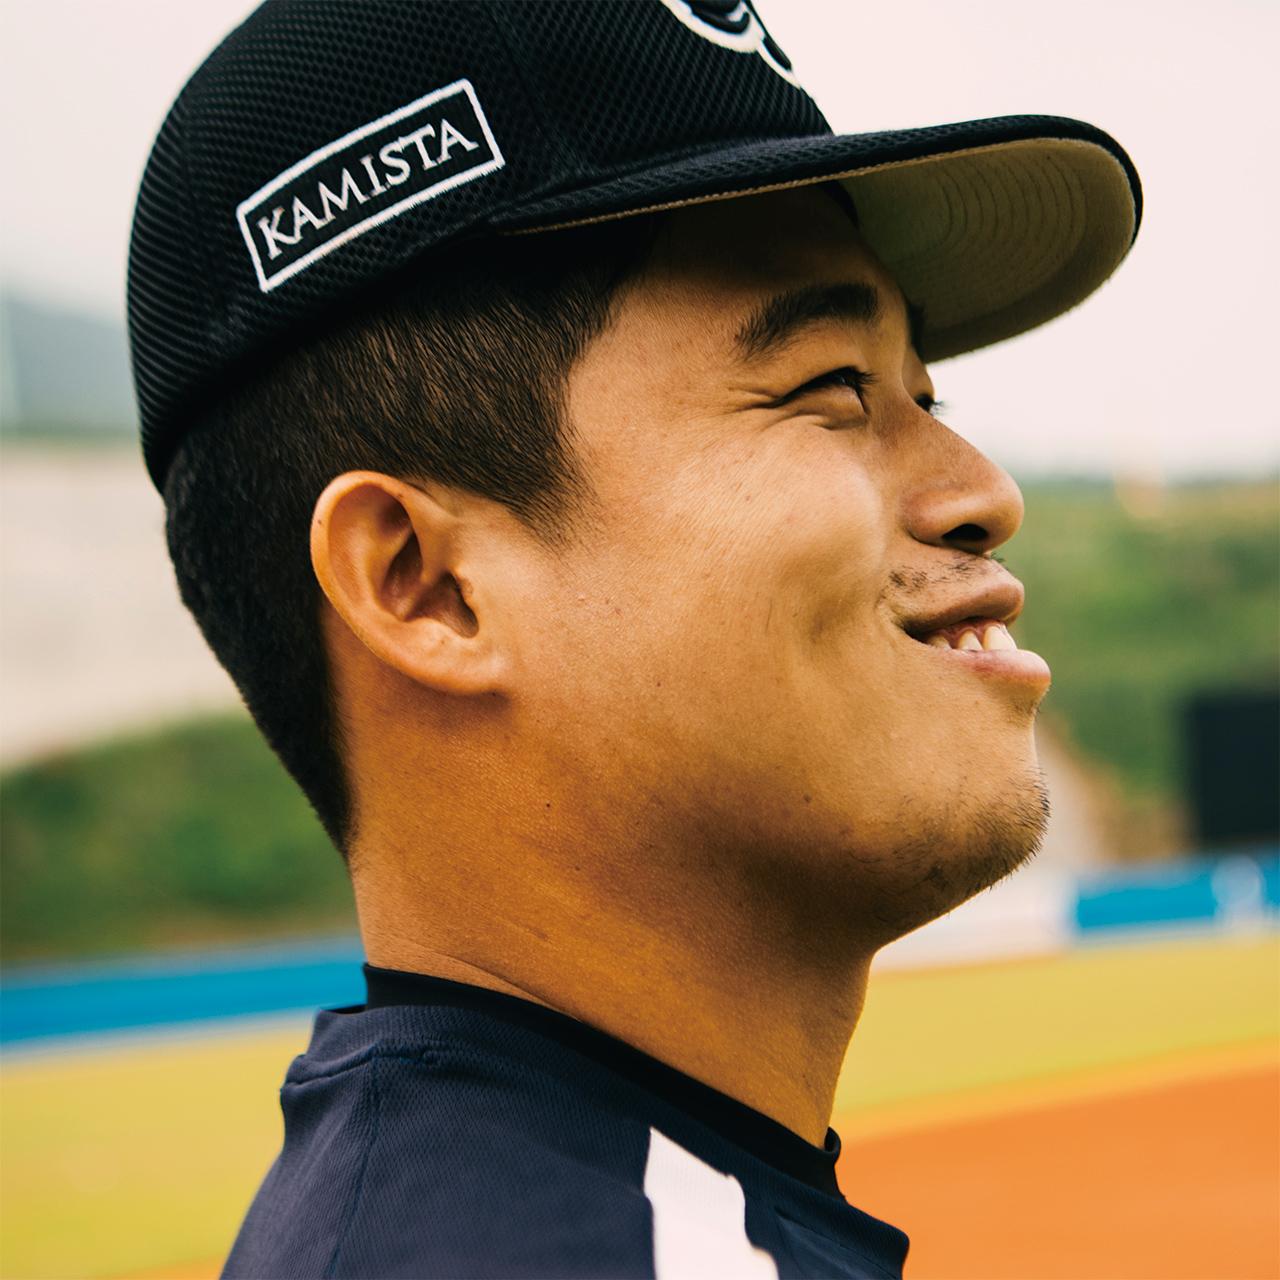 "<strong>동주봉(66번, 1991년생), 외야수</strong><br/> ""야구라는 거, 운동장 있는 게 행복해서 지금도 나오면 그냥 재미있어요. 잘되든 안되든. 앞으로 제가 좋아하고 행복할 수 있는 걸 해야 해서 프로로 가야 될 것 같아요."""